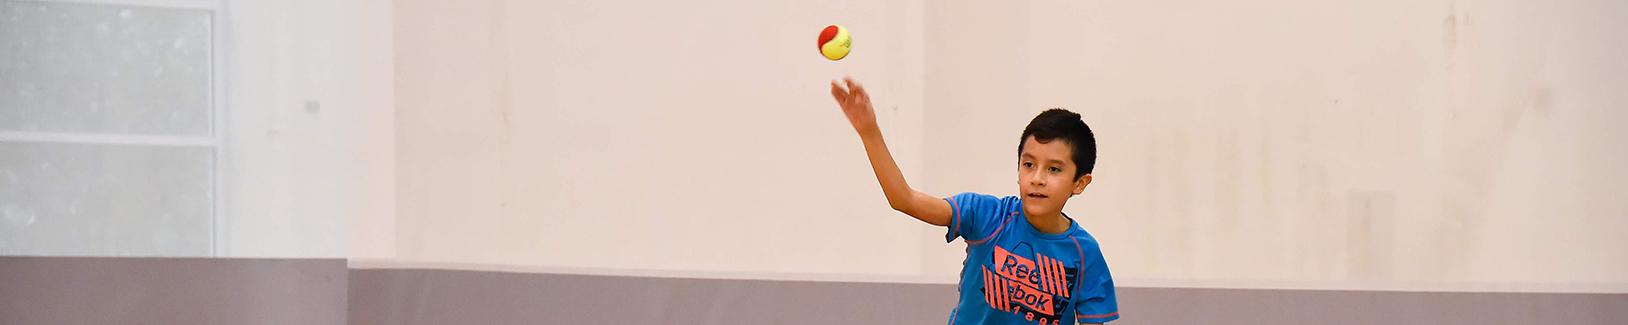 Boy throws tennis ball